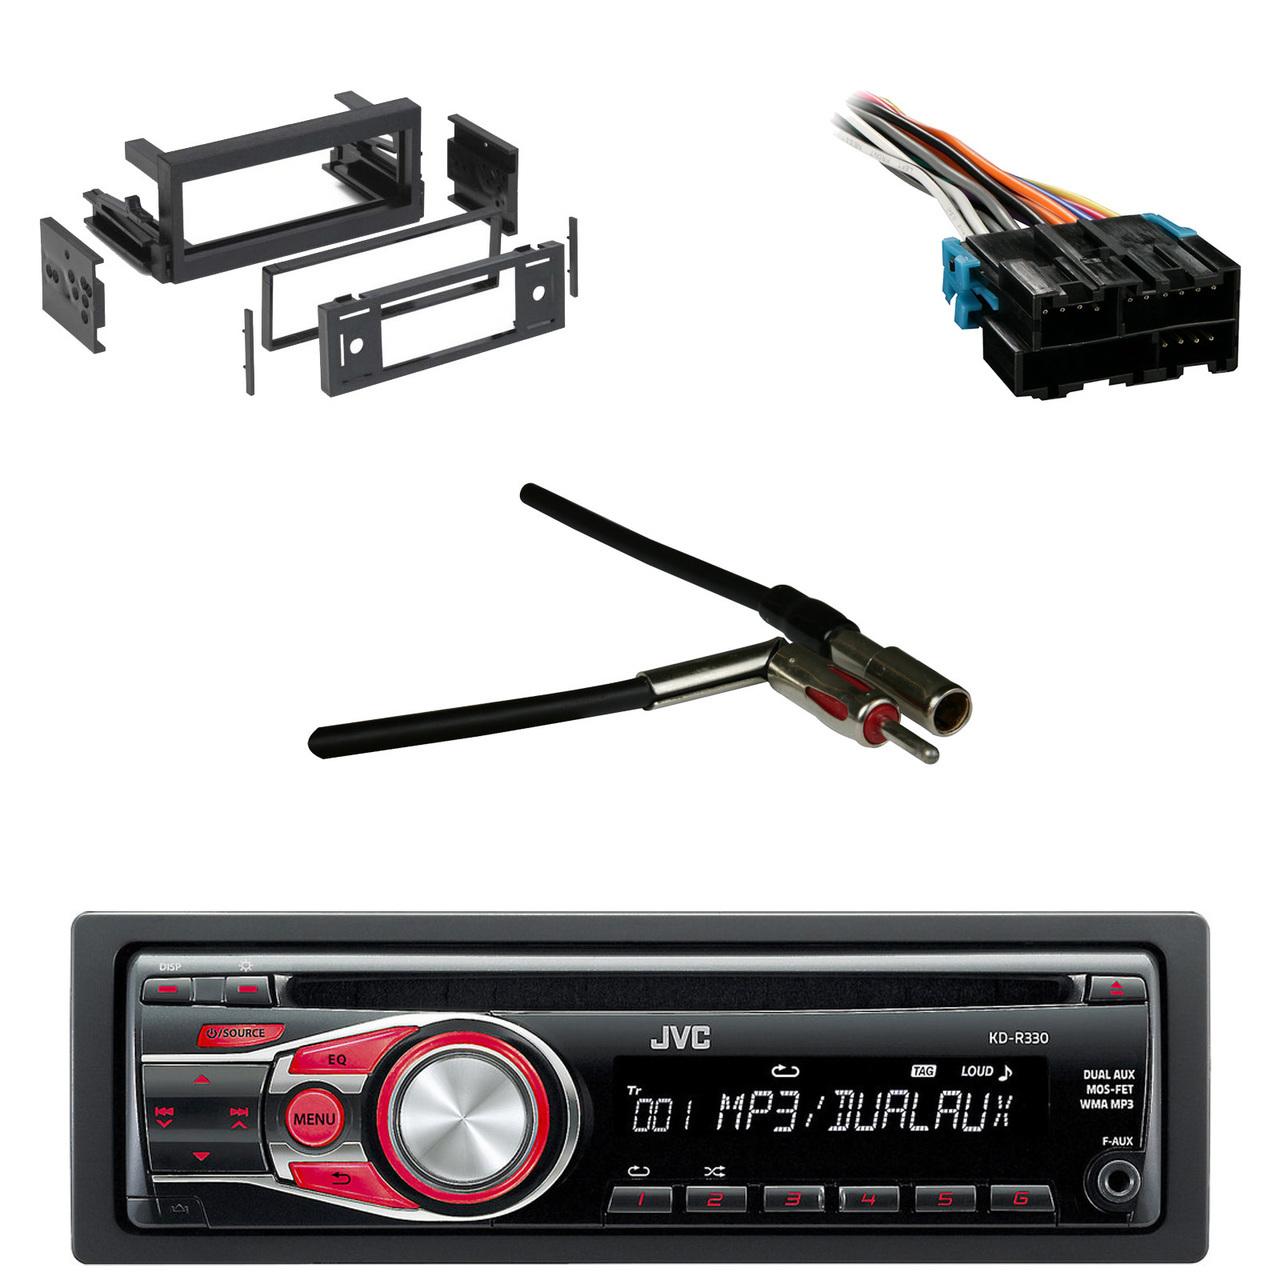 AG_7462] Jvc Kd R330 Wiring Harness Schematic WiringOmen Unbe Apan Pneu Tzici Rect Mohammedshrine Librar Wiring 101